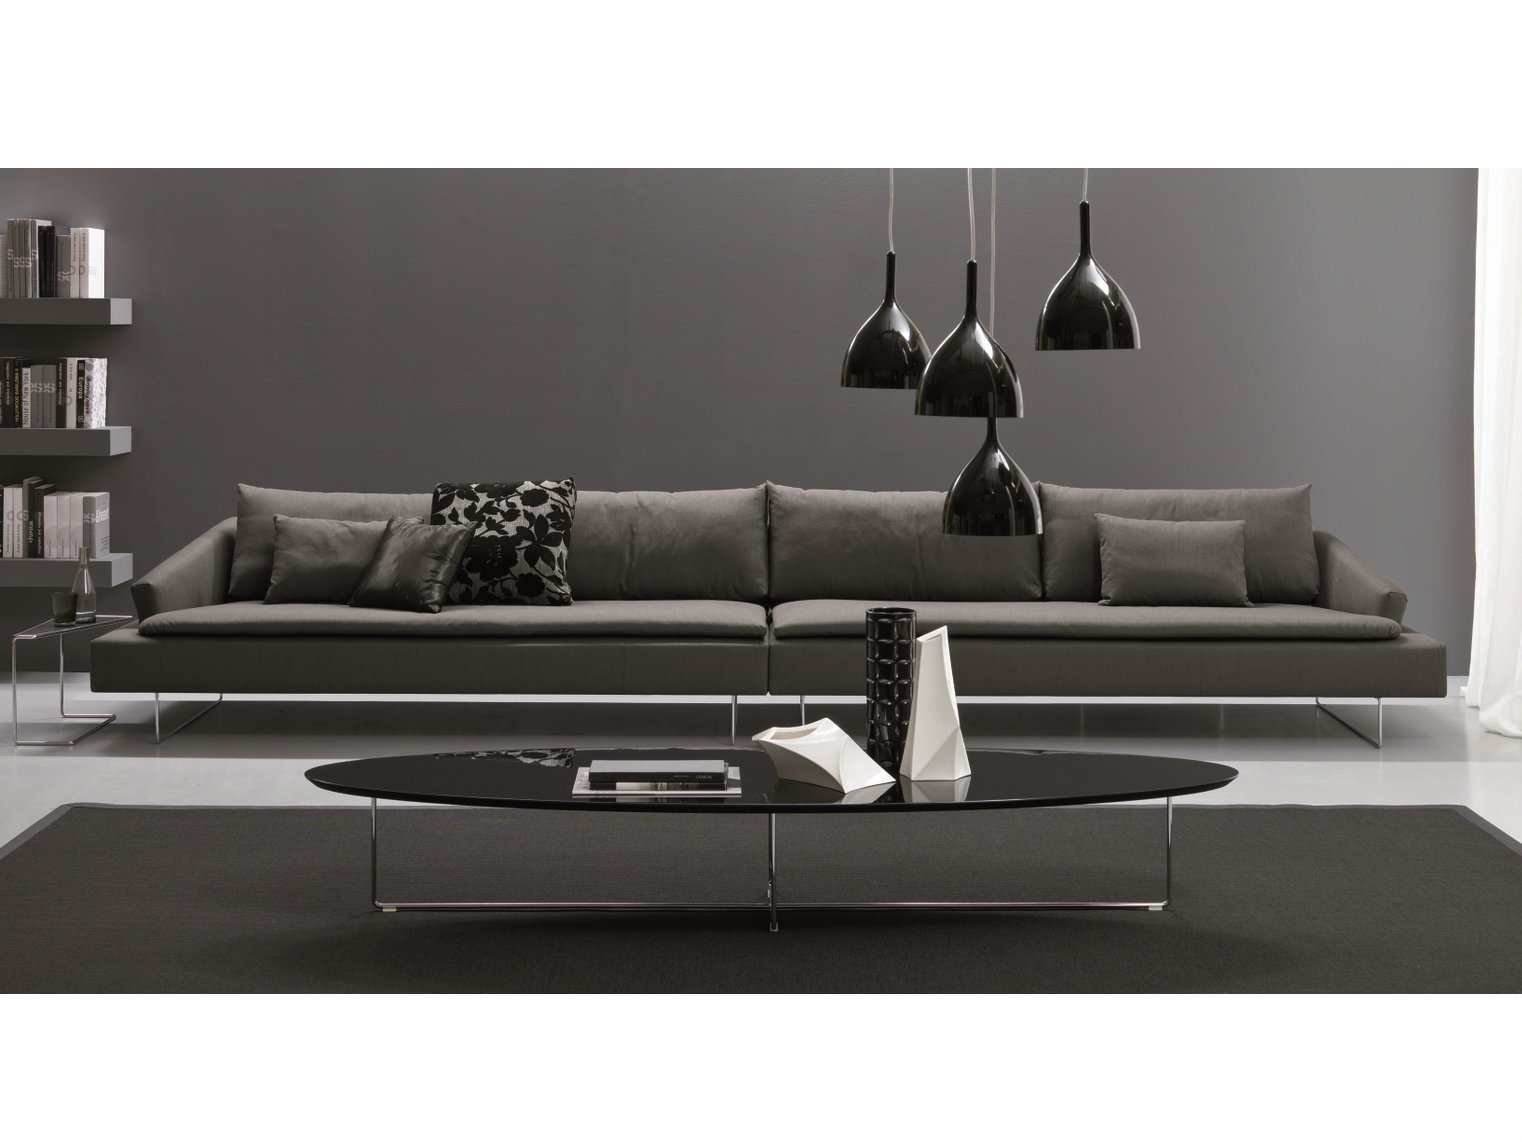 Itaca 6 seater sofa by bontempi casa design angelo natuzzi for 6 seater sectional sofa